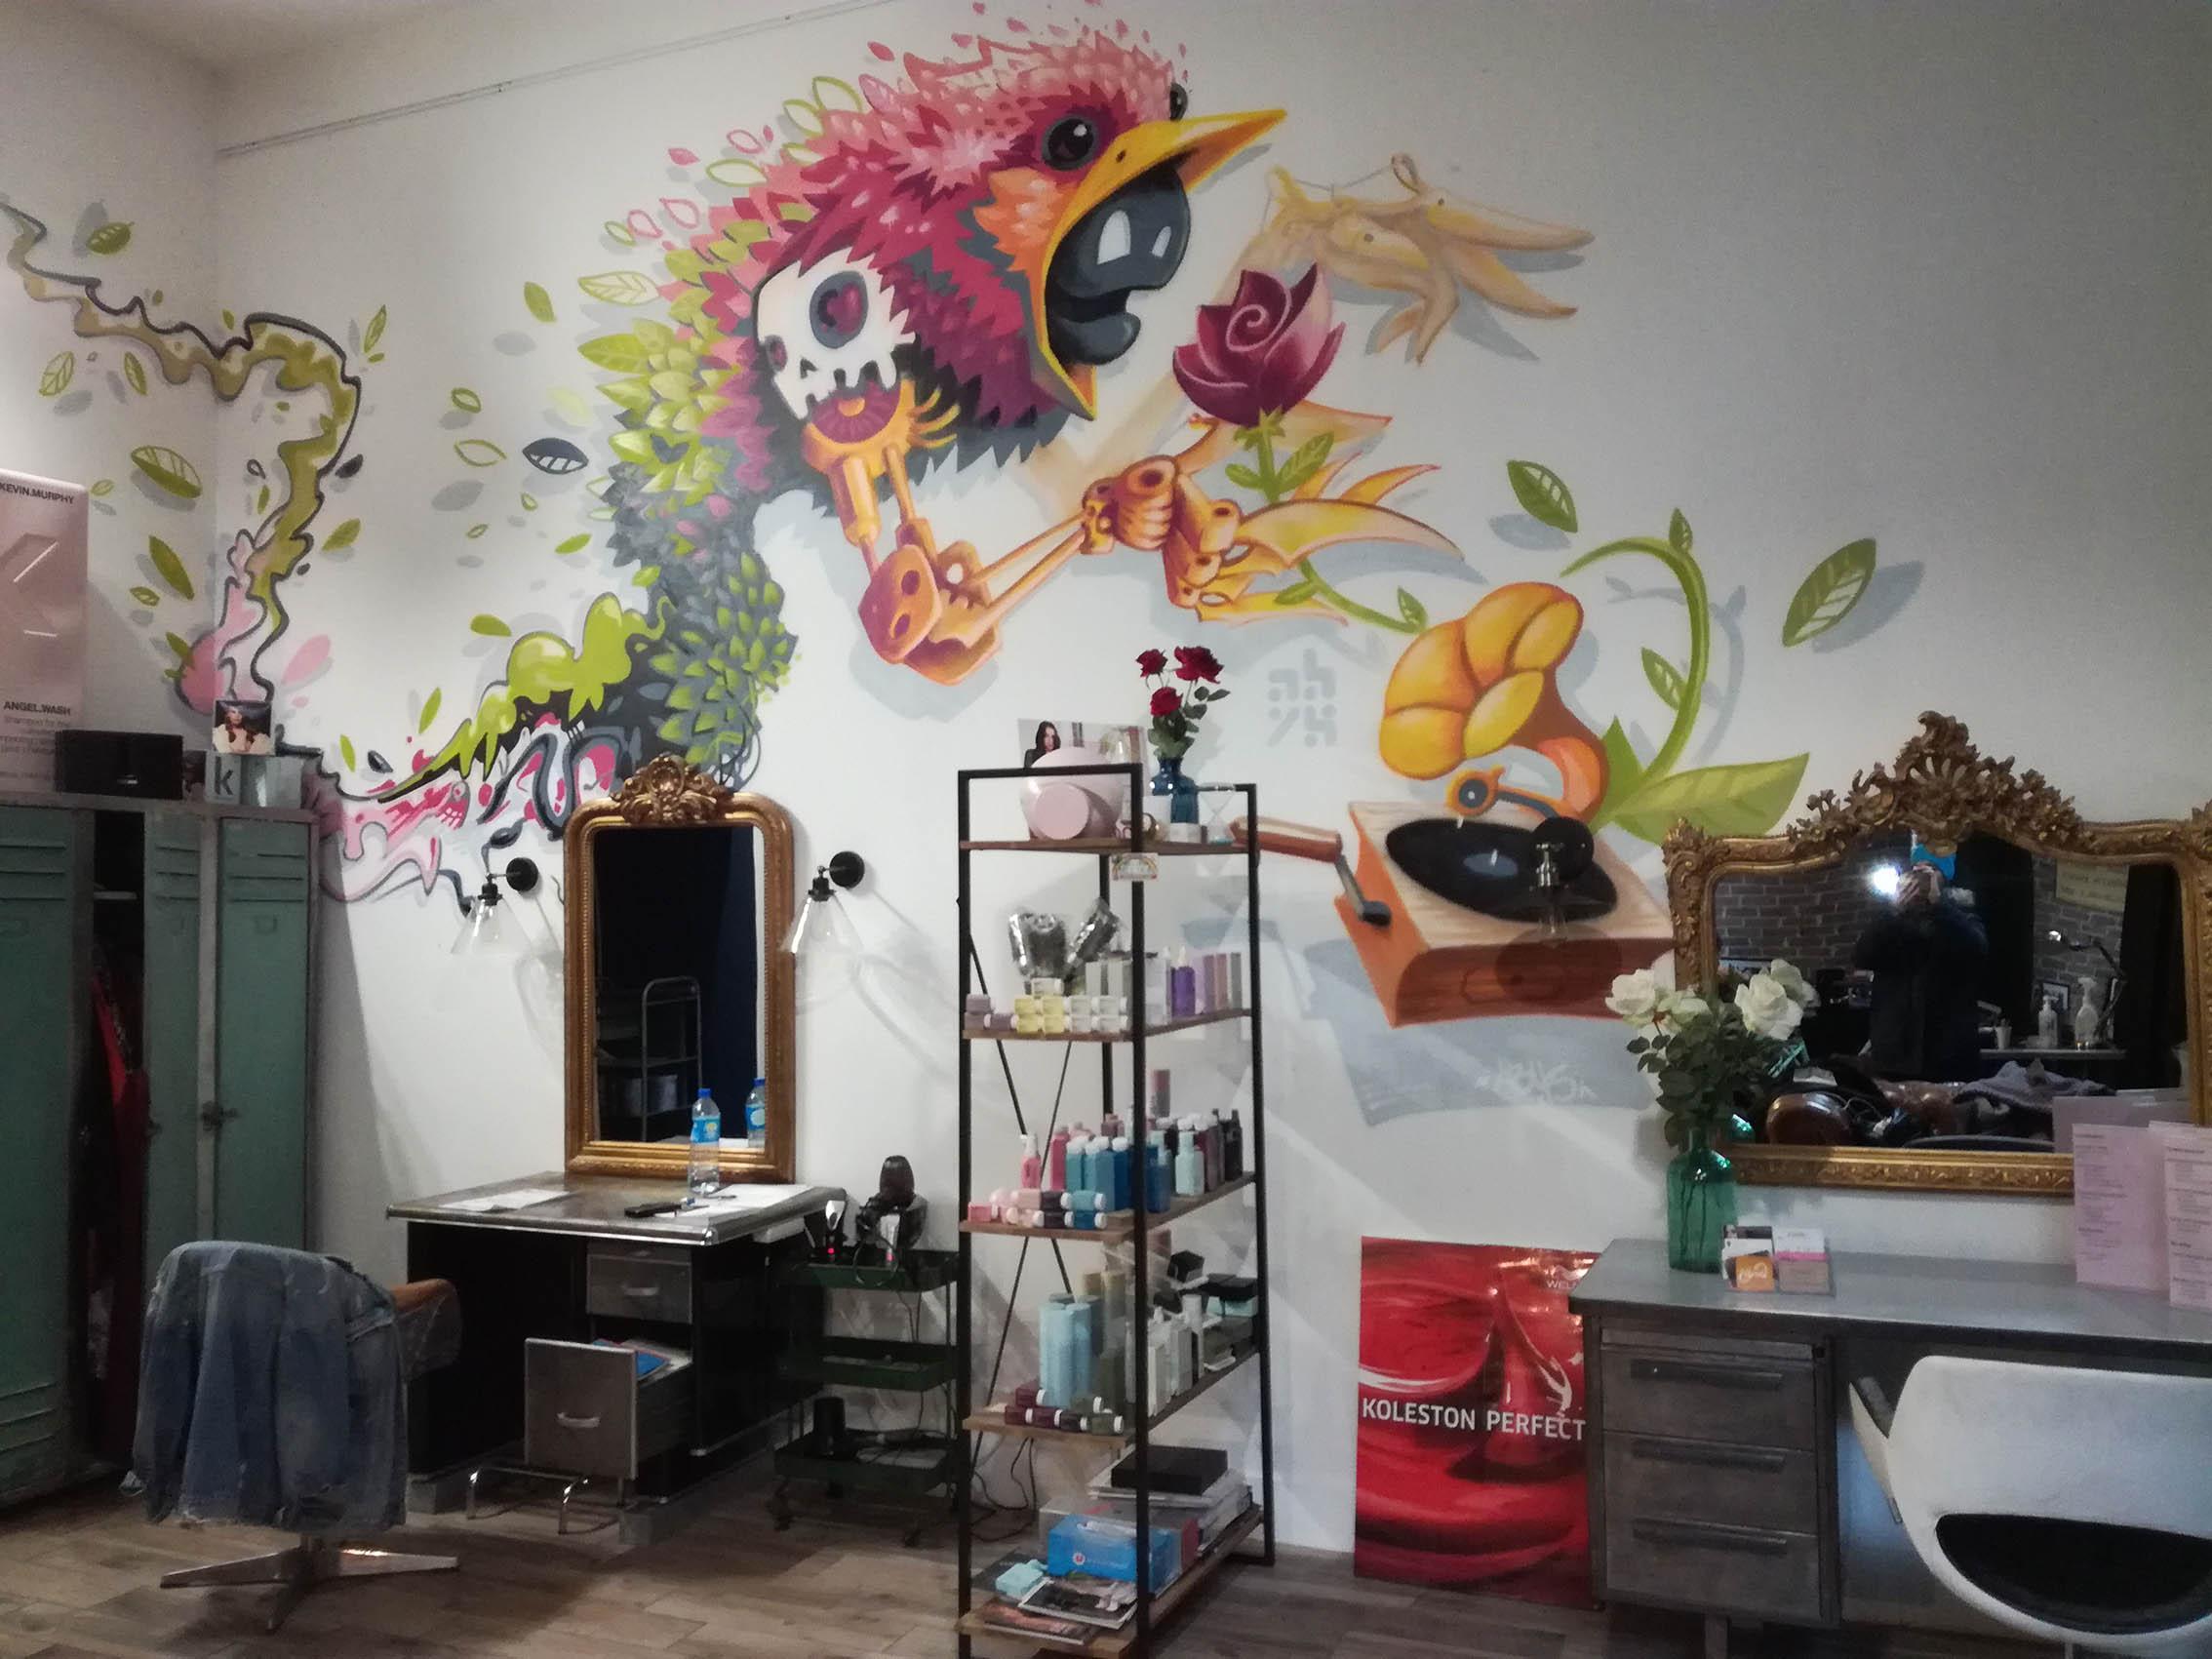 studio inside coiffure lyon - deco graffiti - streetart abys2fly